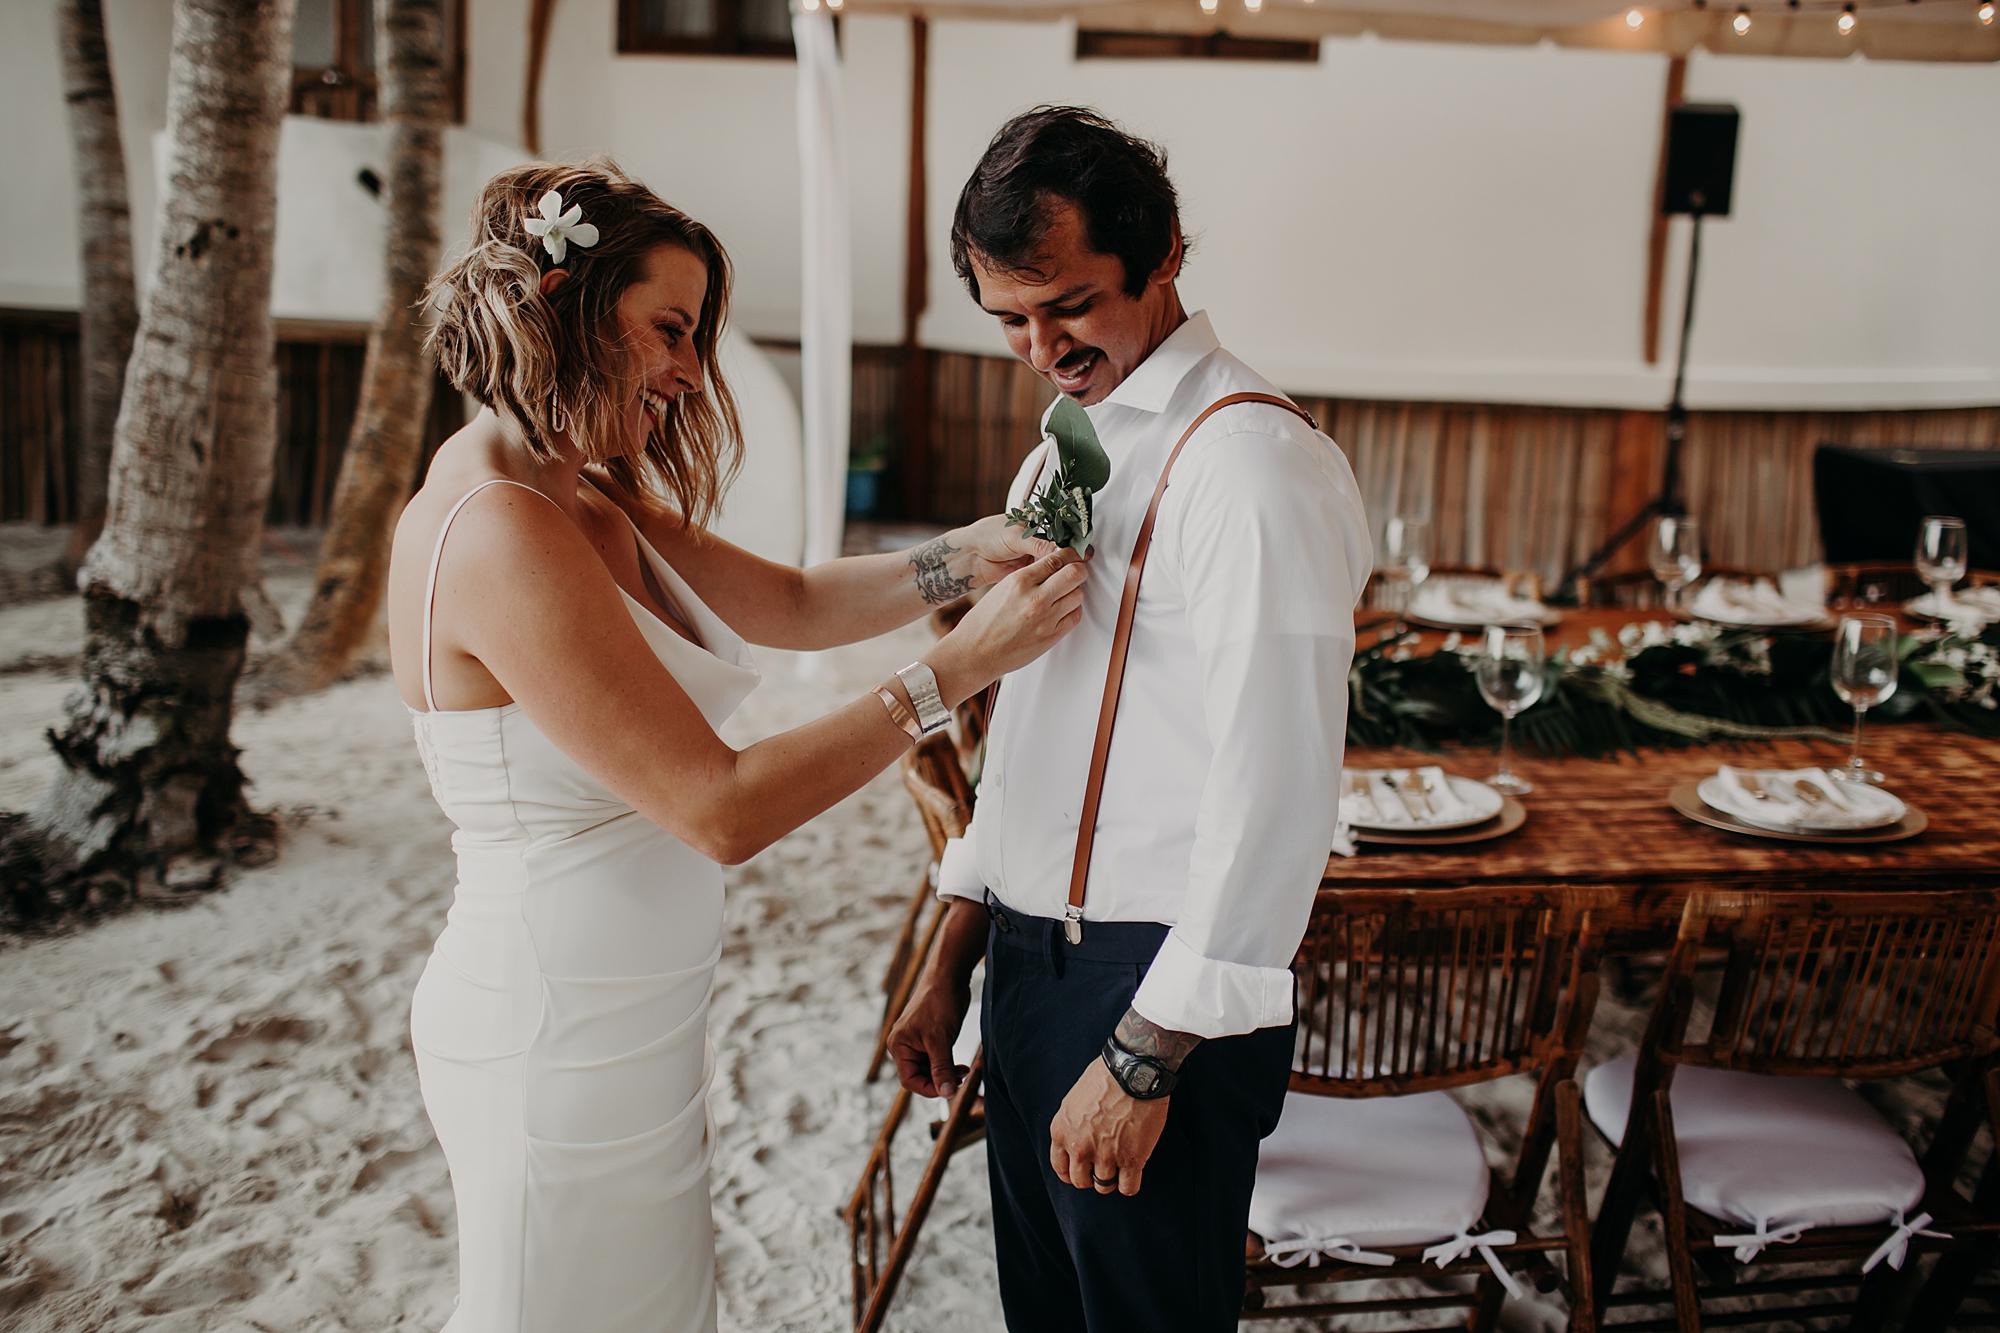 Danielle-San-Antonio-Wedding-Photographer-97_WEB.jpg